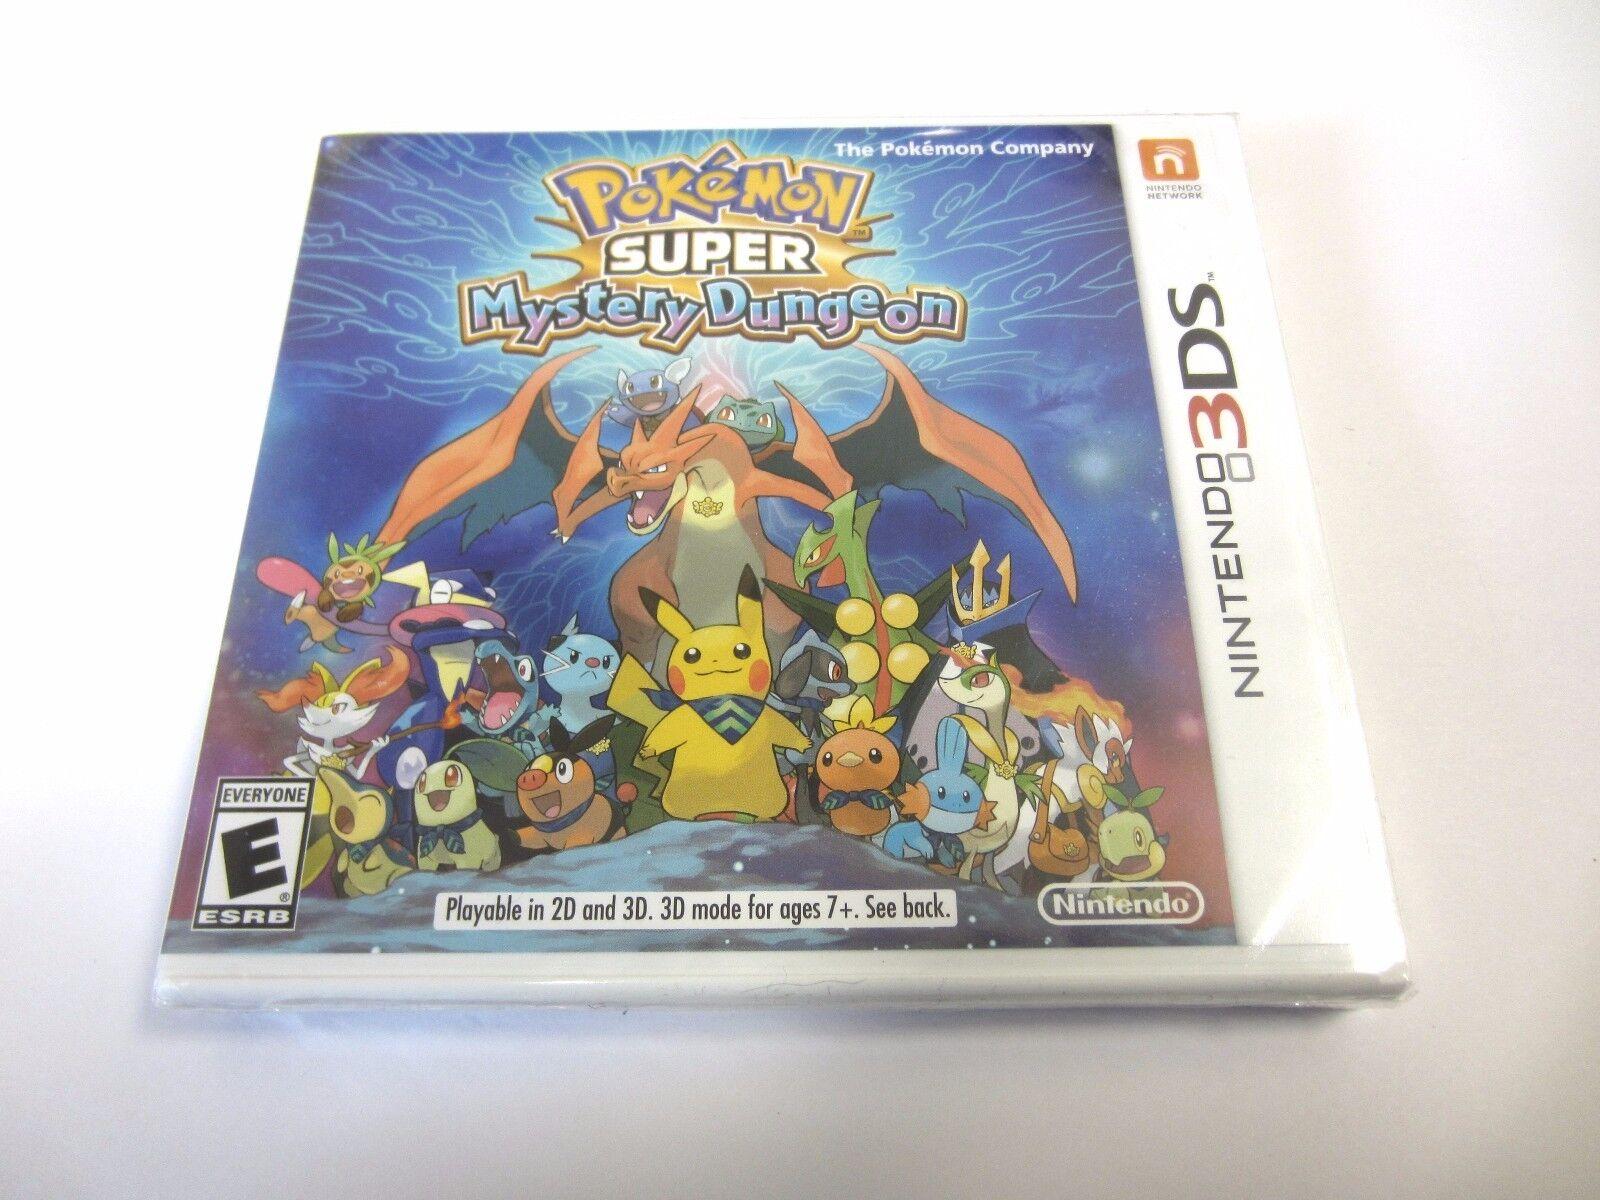 Купить Nintendo - Pokemon Super Mystery Dungeon for Nintendo 3DS & 2DS New & Sealed